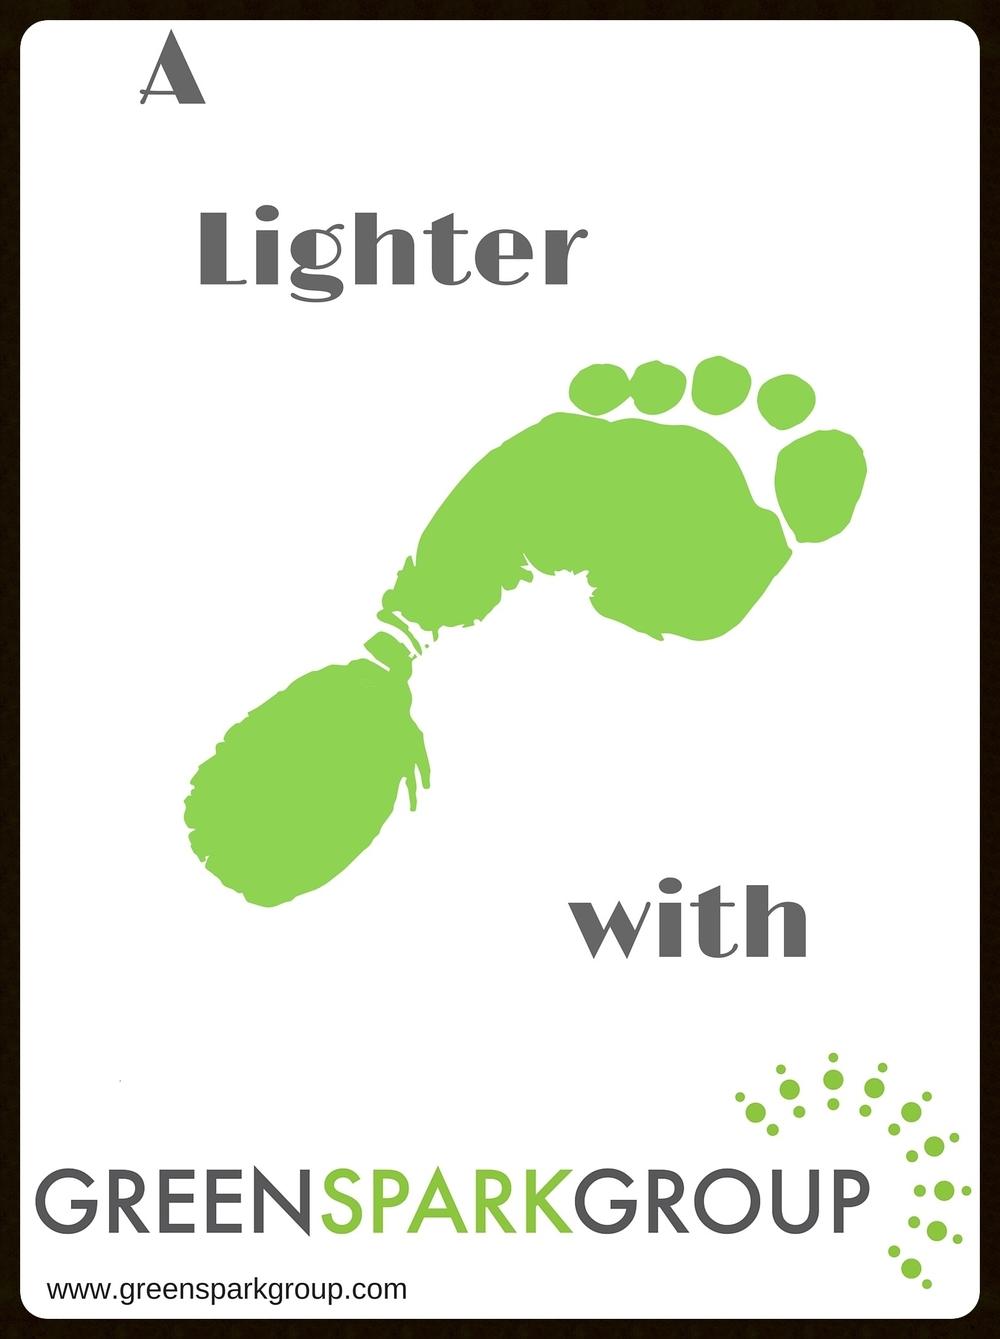 Light footprint_image.jpg